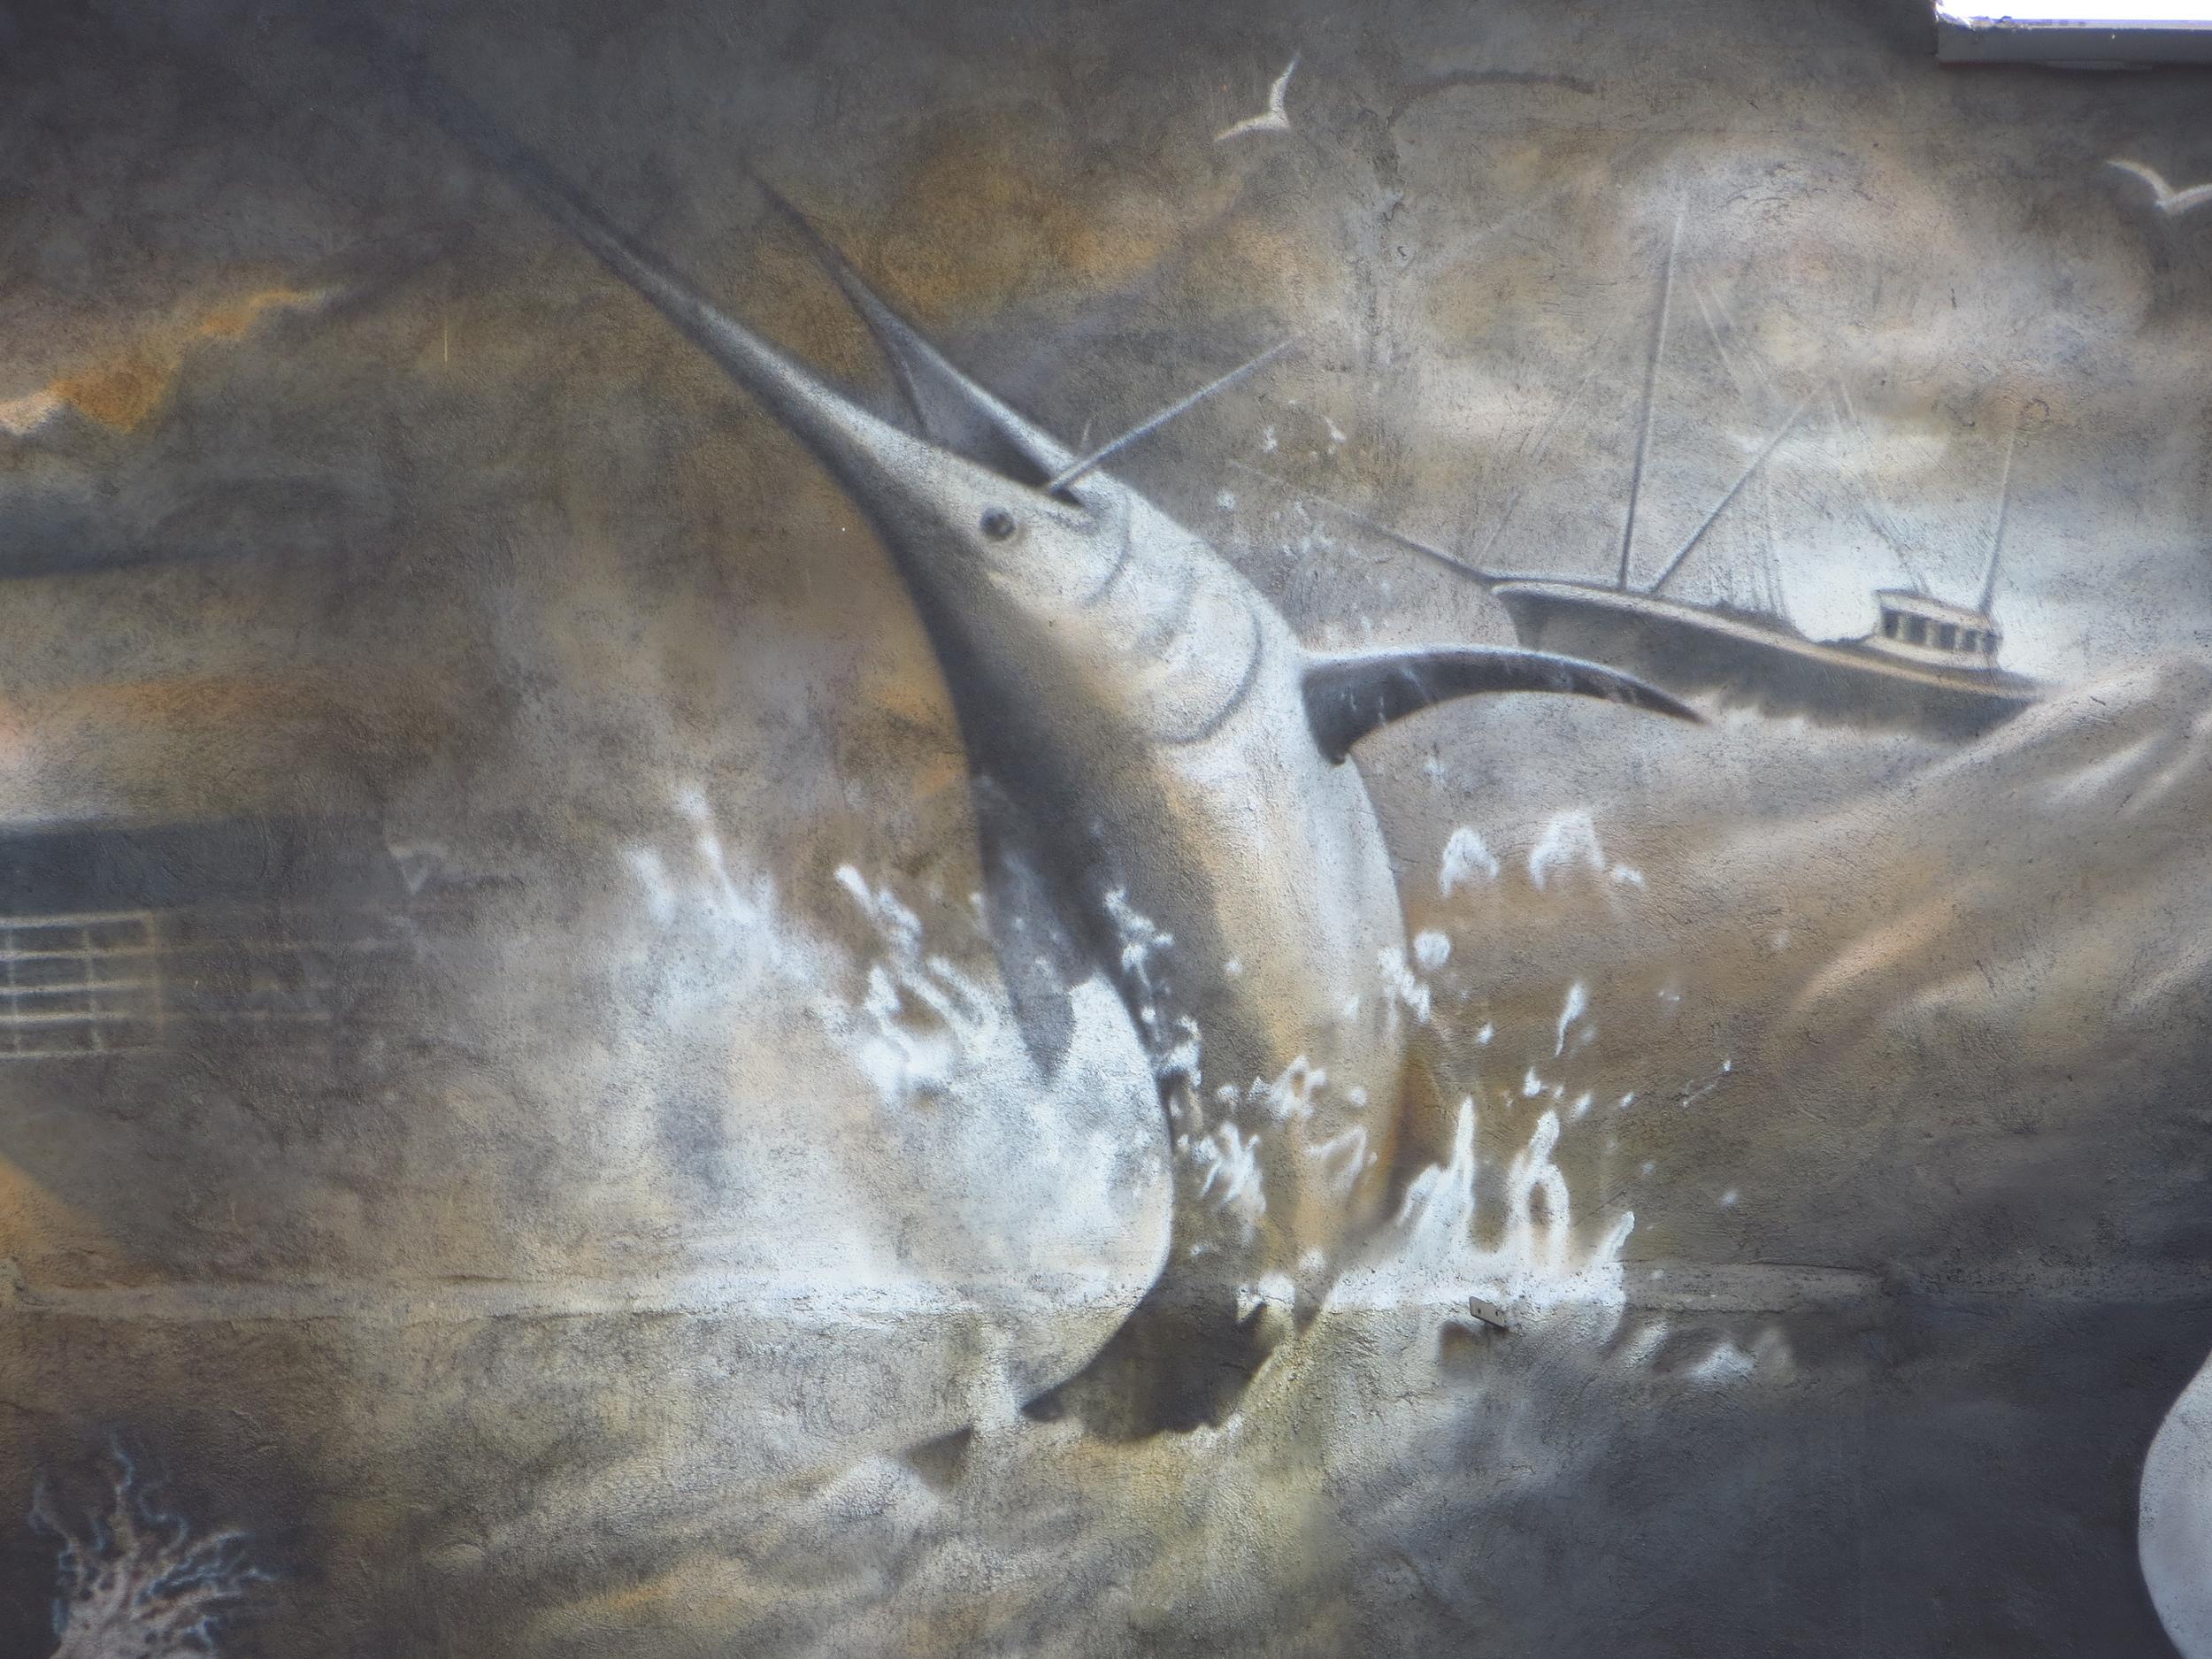 Massive marlin mural